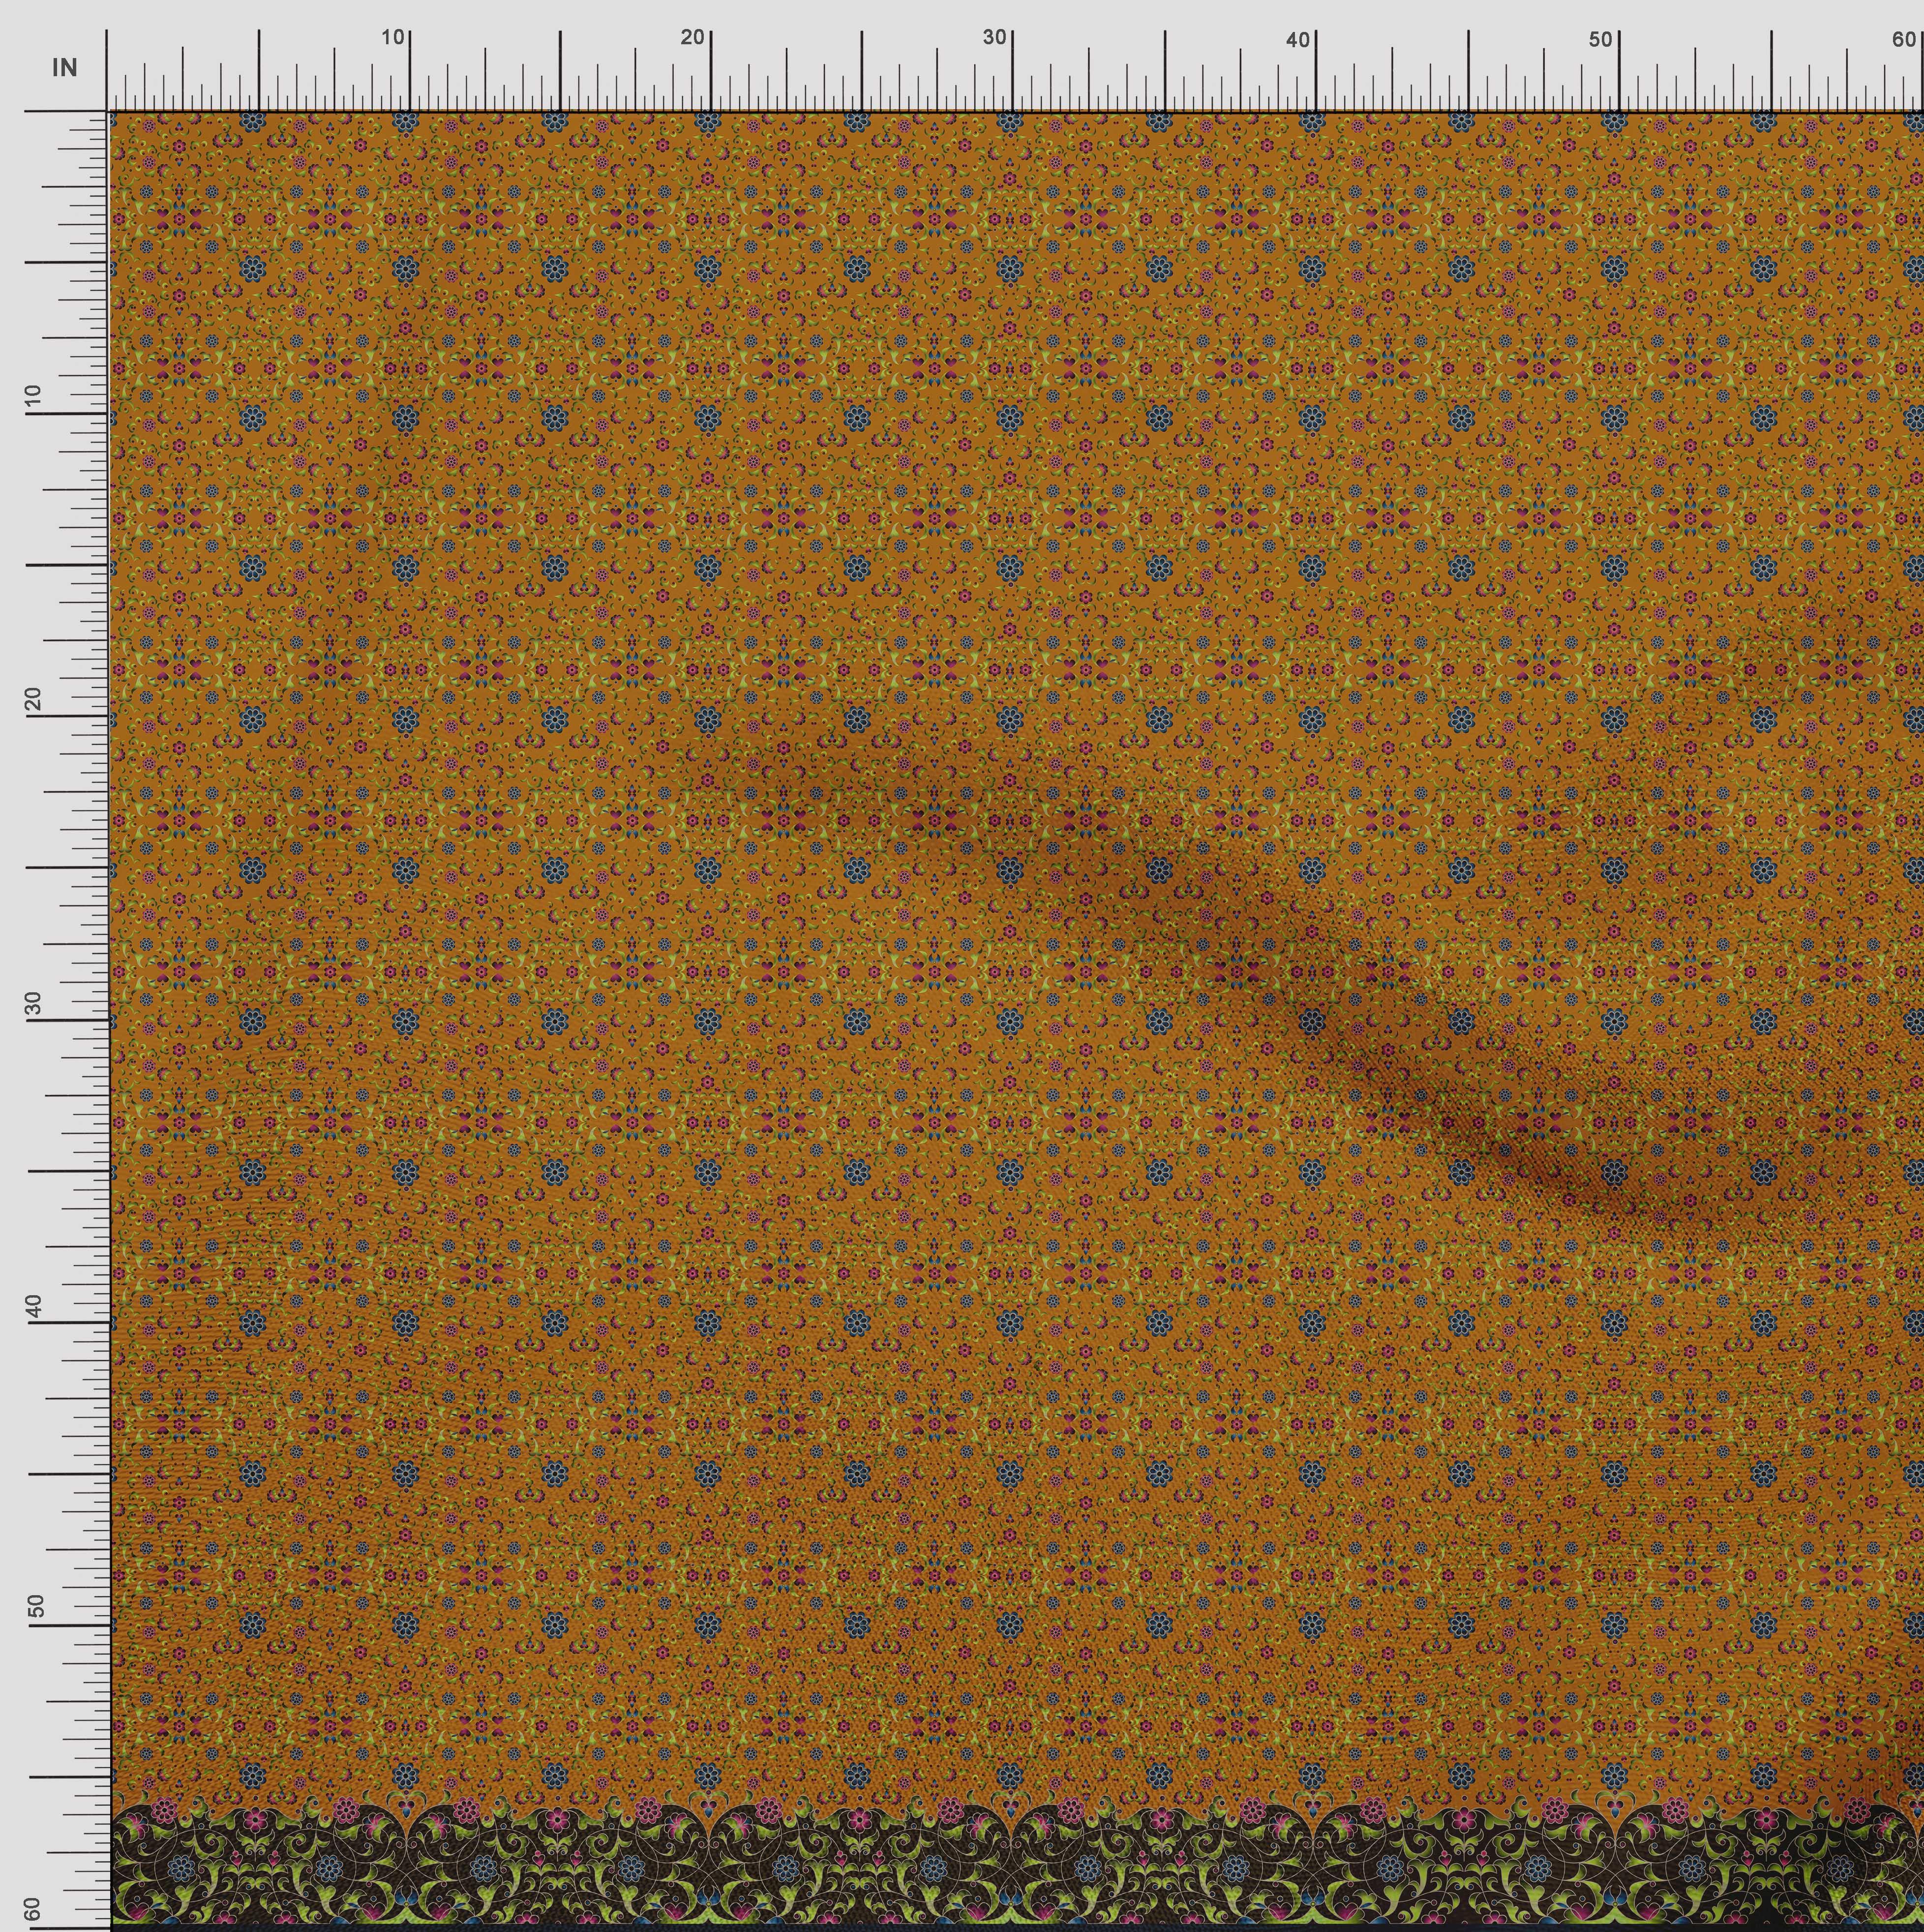 Soimoi-Cotton-Poplin-Fabric-Floral-amp-Leaves-Panel-Print-Fabric-by-5GU thumbnail 4